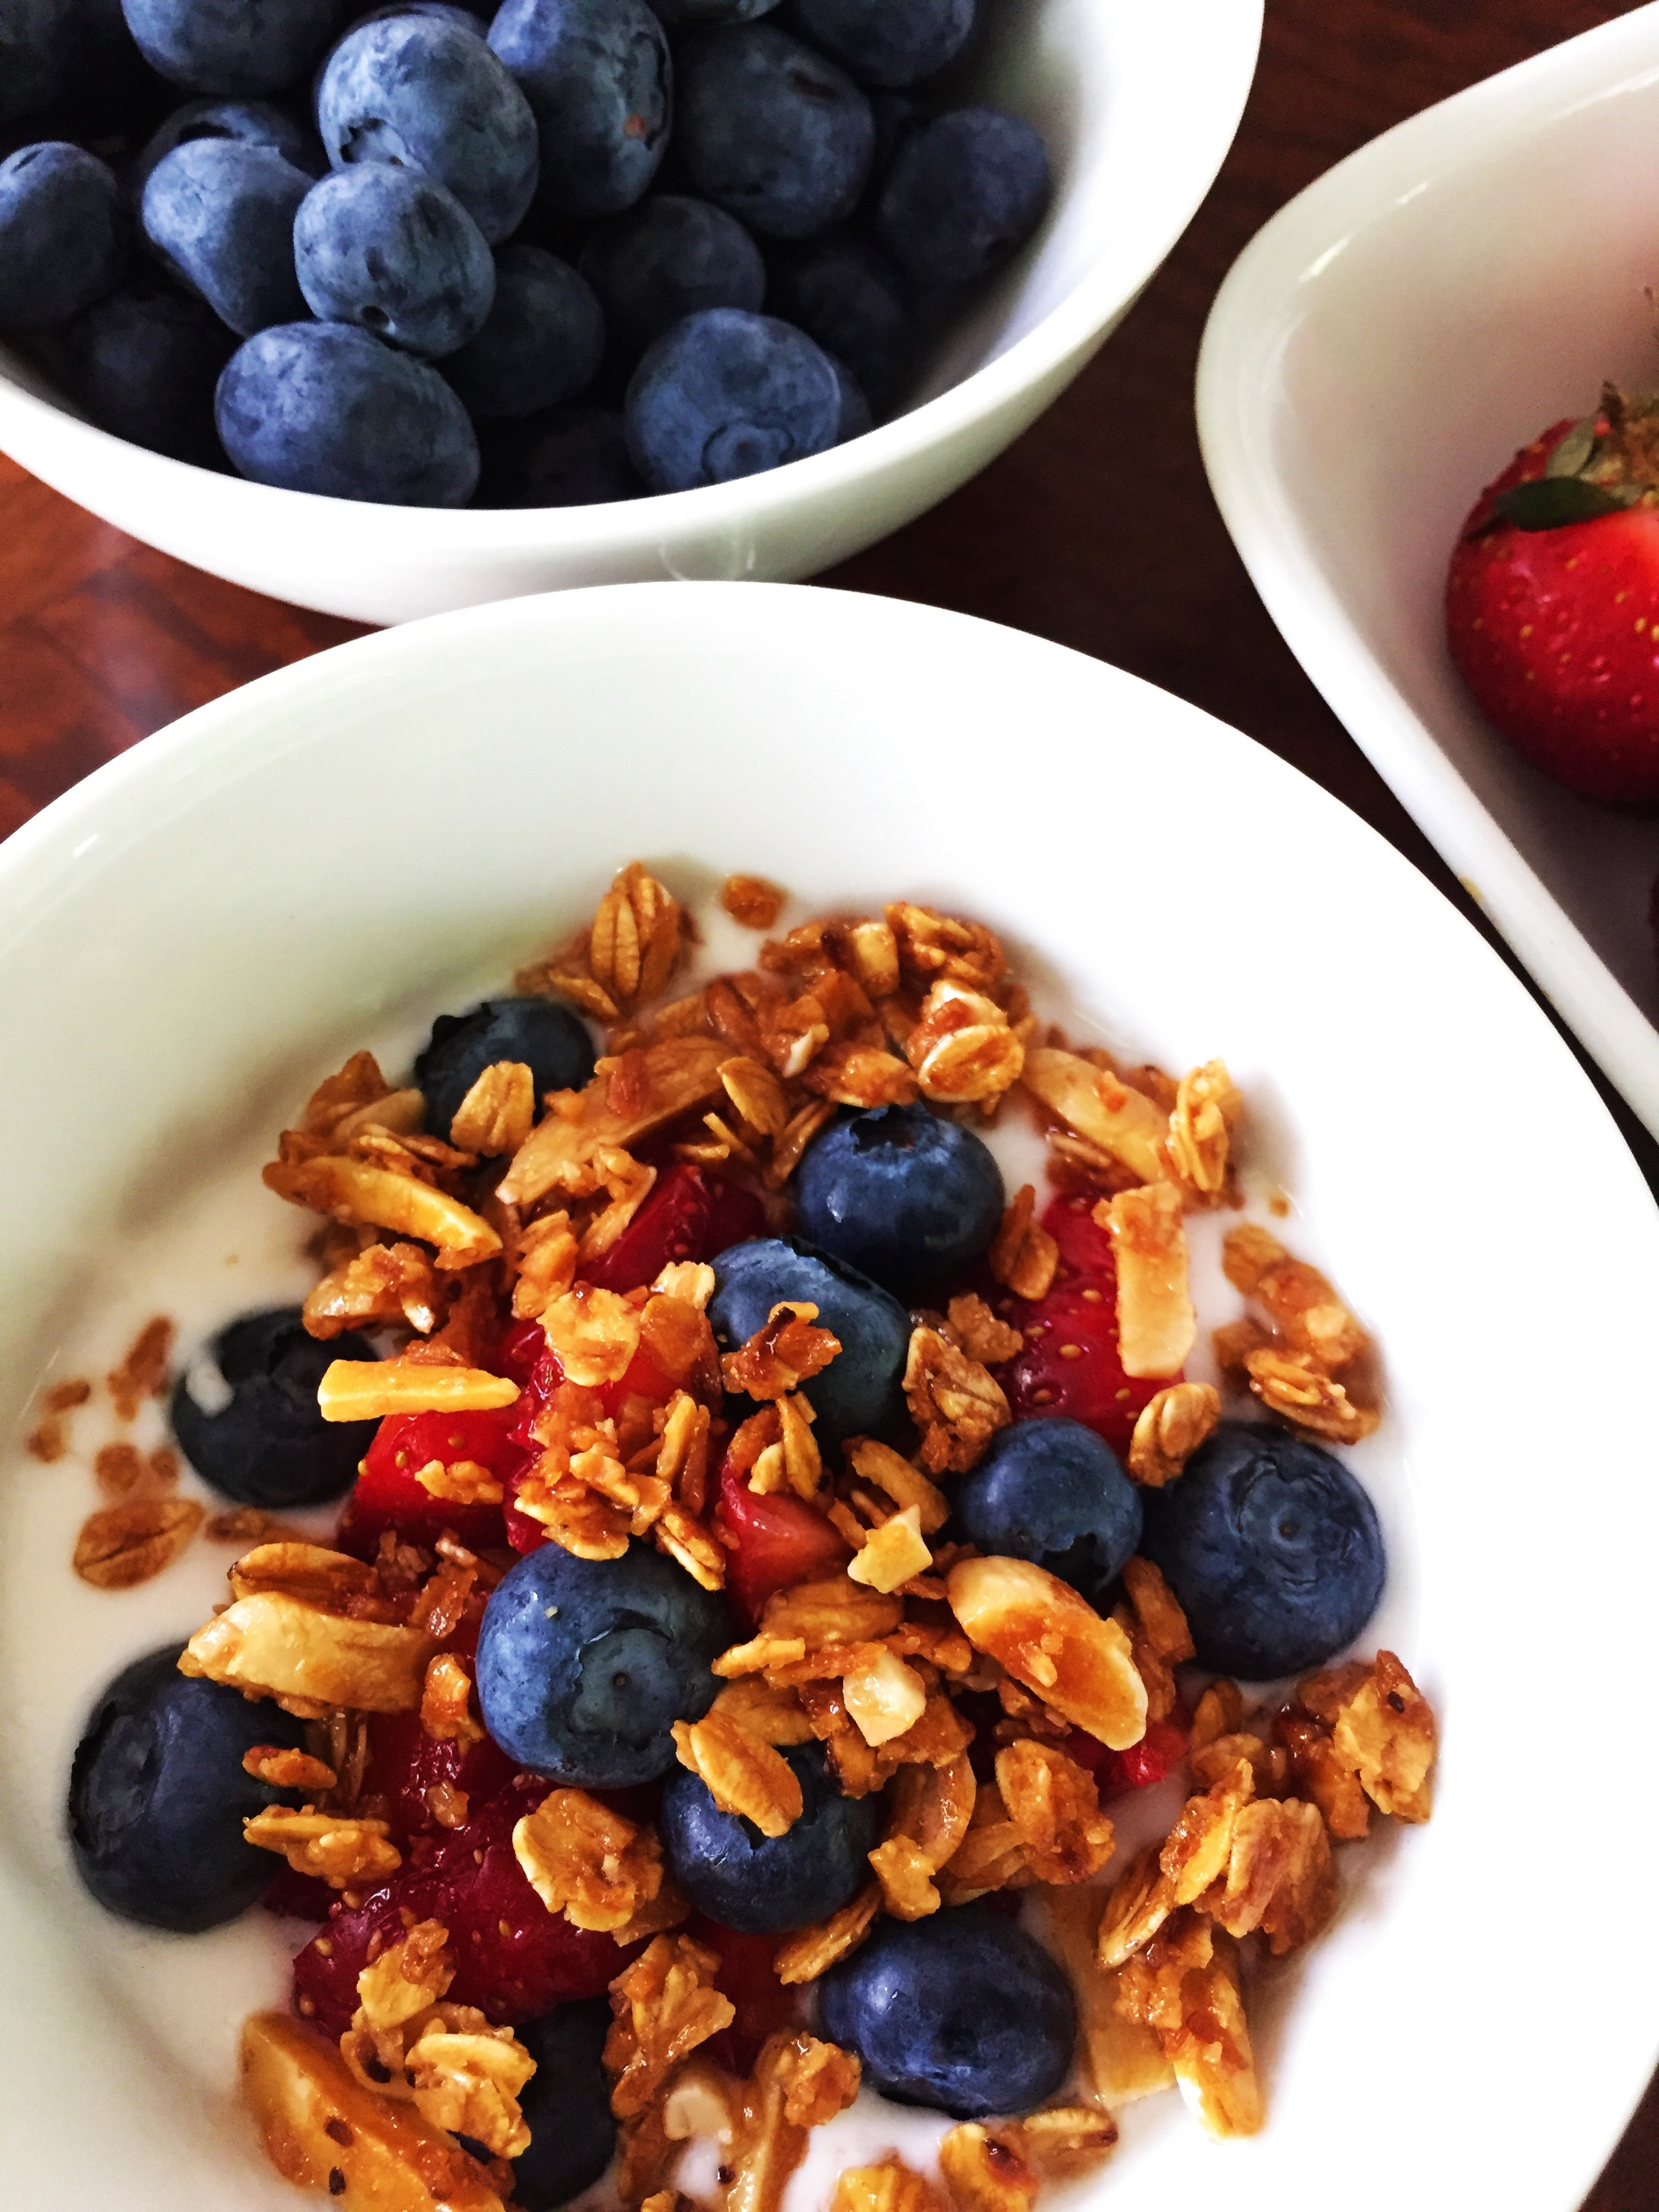 Coconut-Almond Granola over berries and yogurt in the Adventure Kitchen.